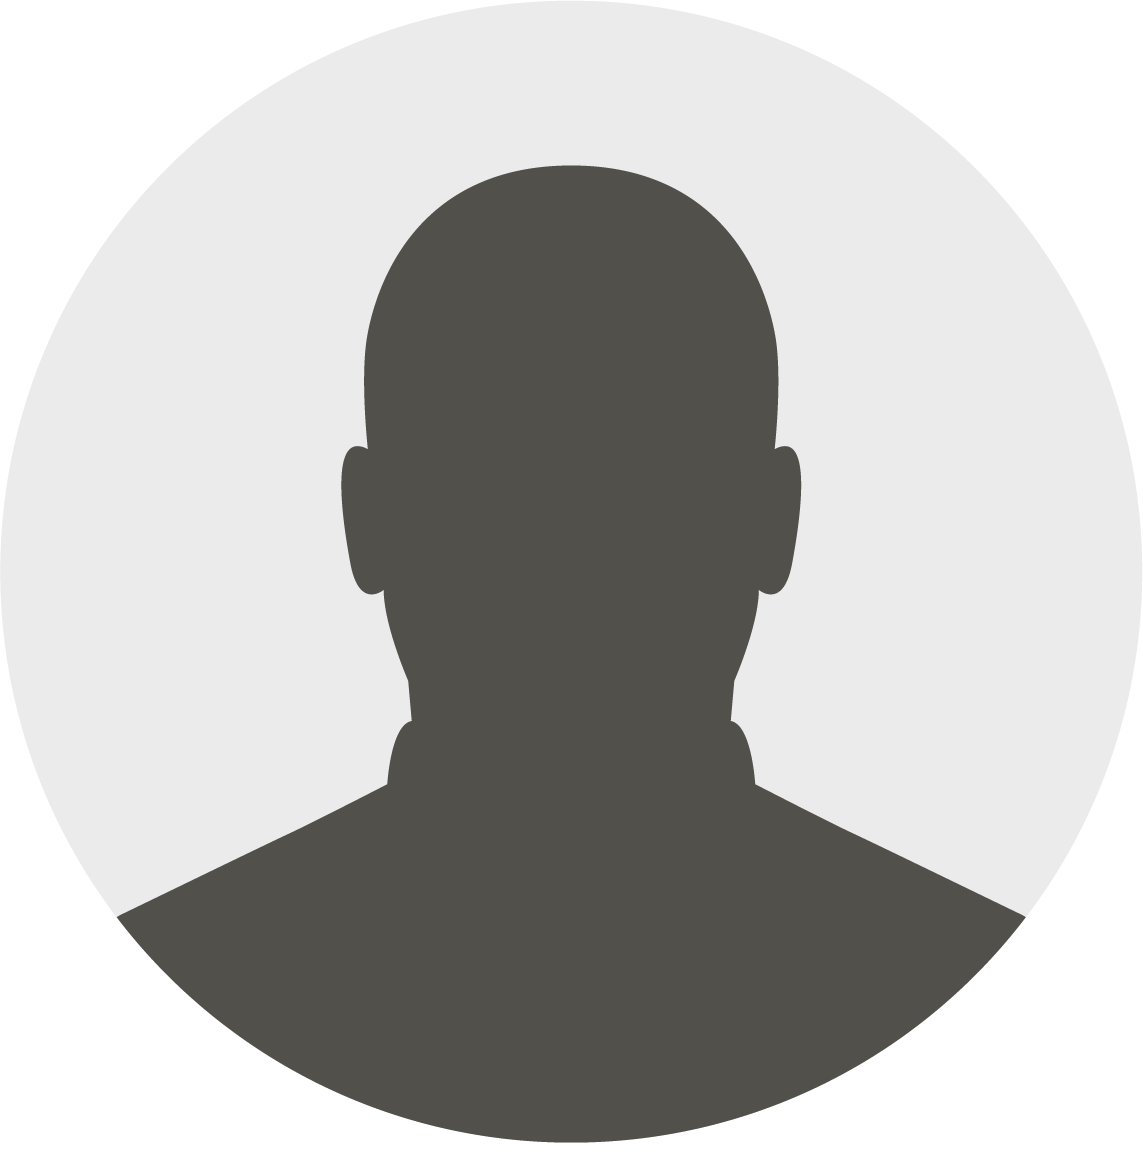 Samuel Opoku Agyemang